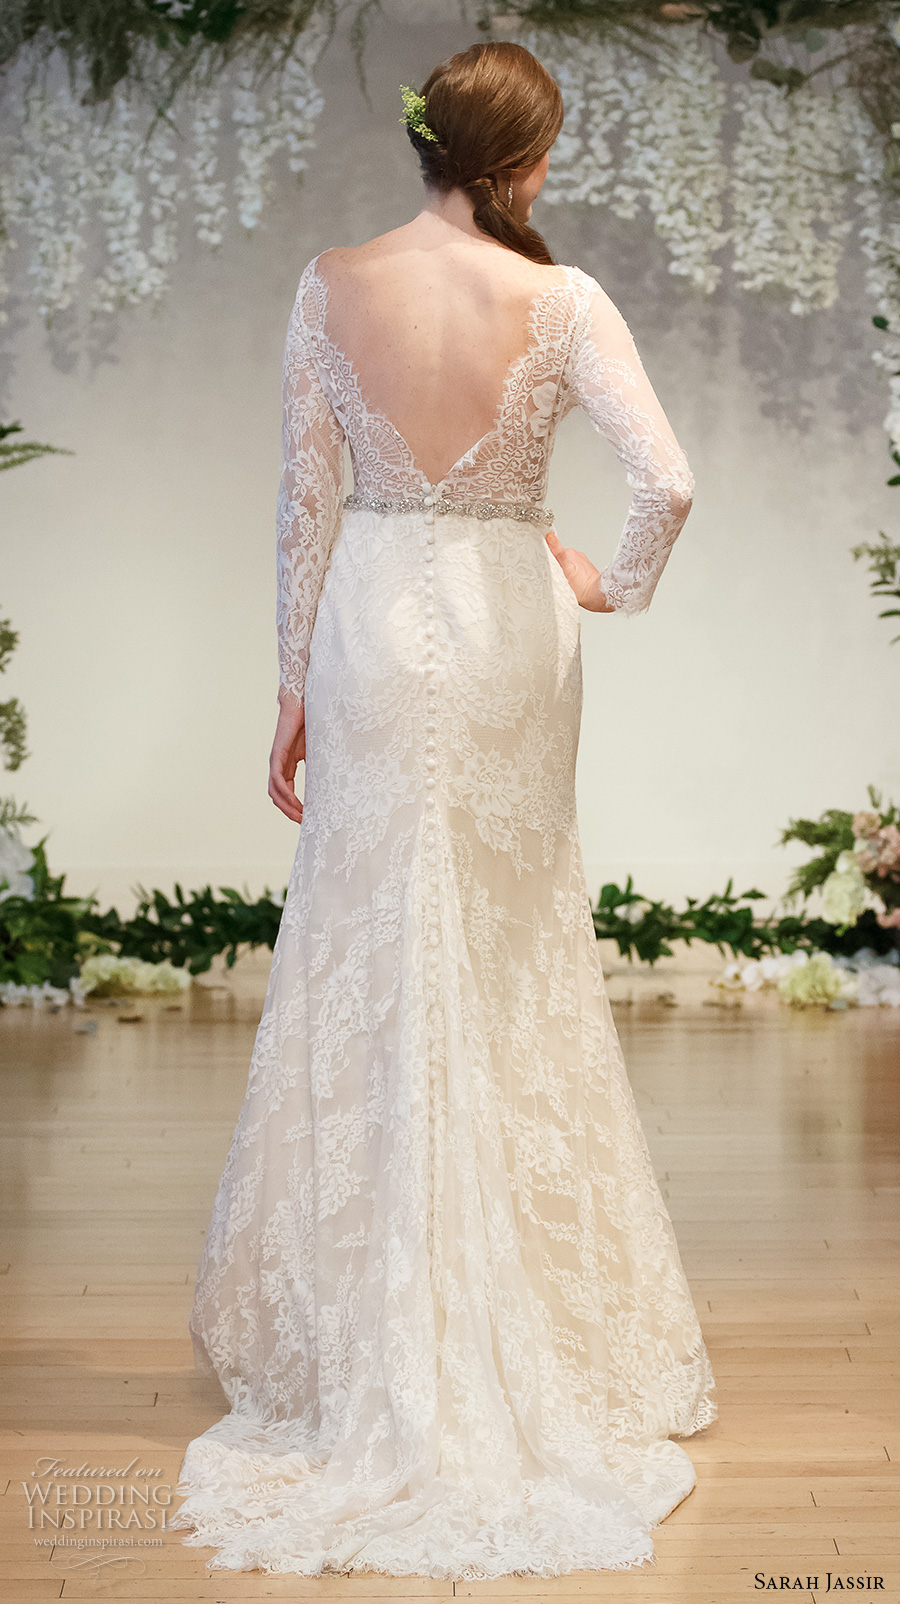 sarah jassir 2017 bridal long sleeves lace v neck deep sweetheart neckline full embellishment elegant sheath wedding dress low v back sweep train (2) bv